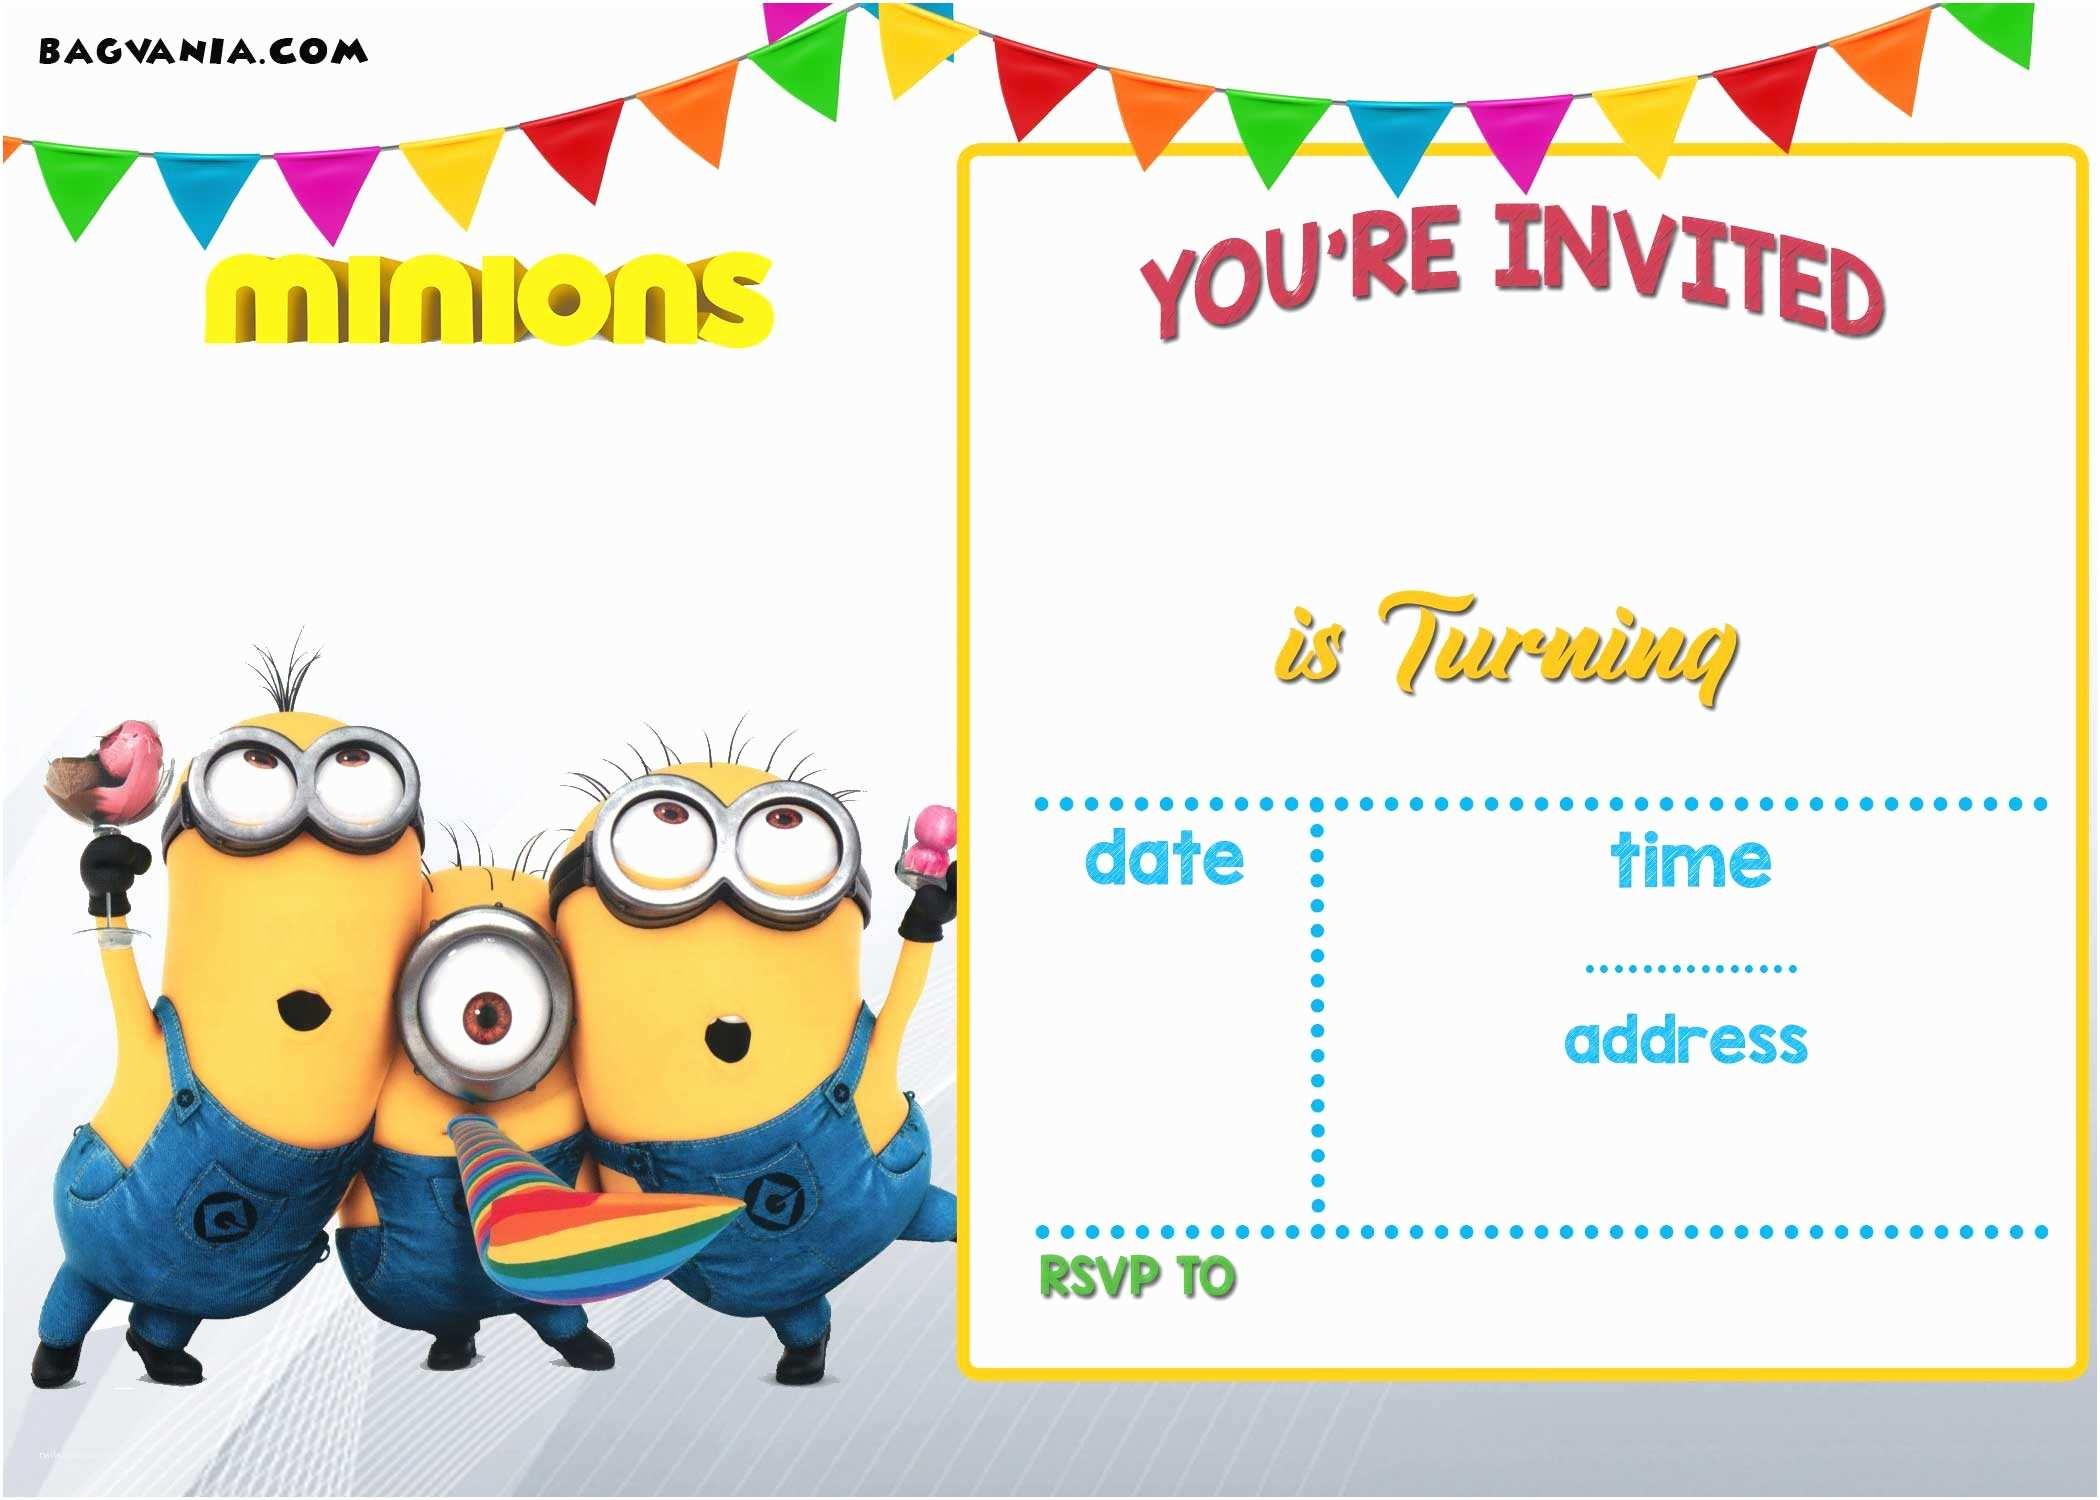 Free Party Invitation Templates Free Printable Minion Birthday Invitation Templates